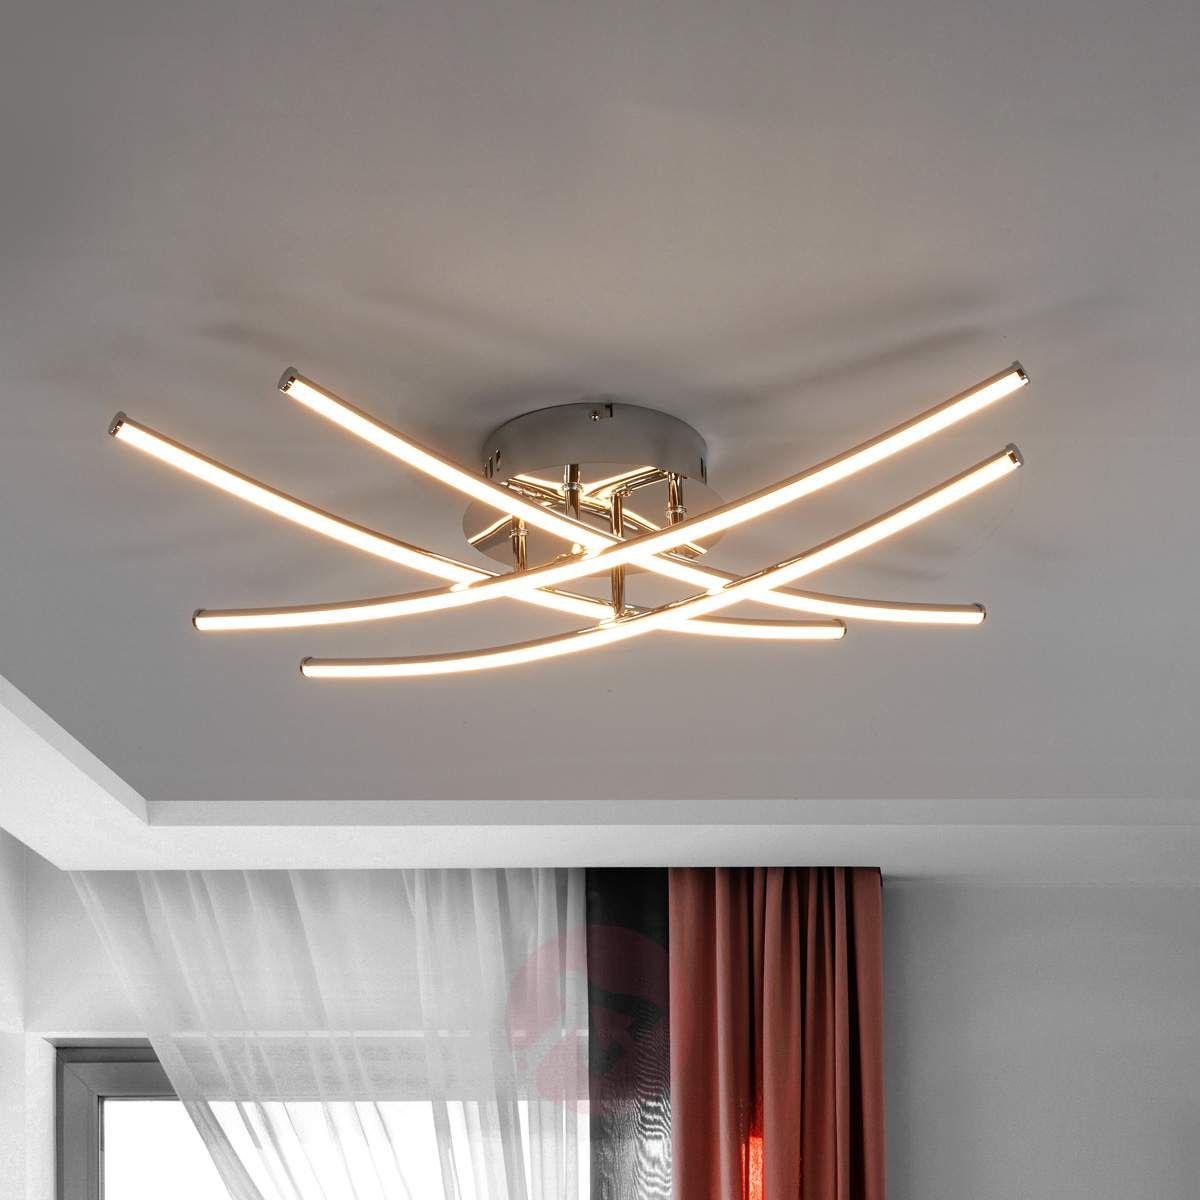 Yael Lampa Sufitowa Led Do Kuchni I Salonu Lampy